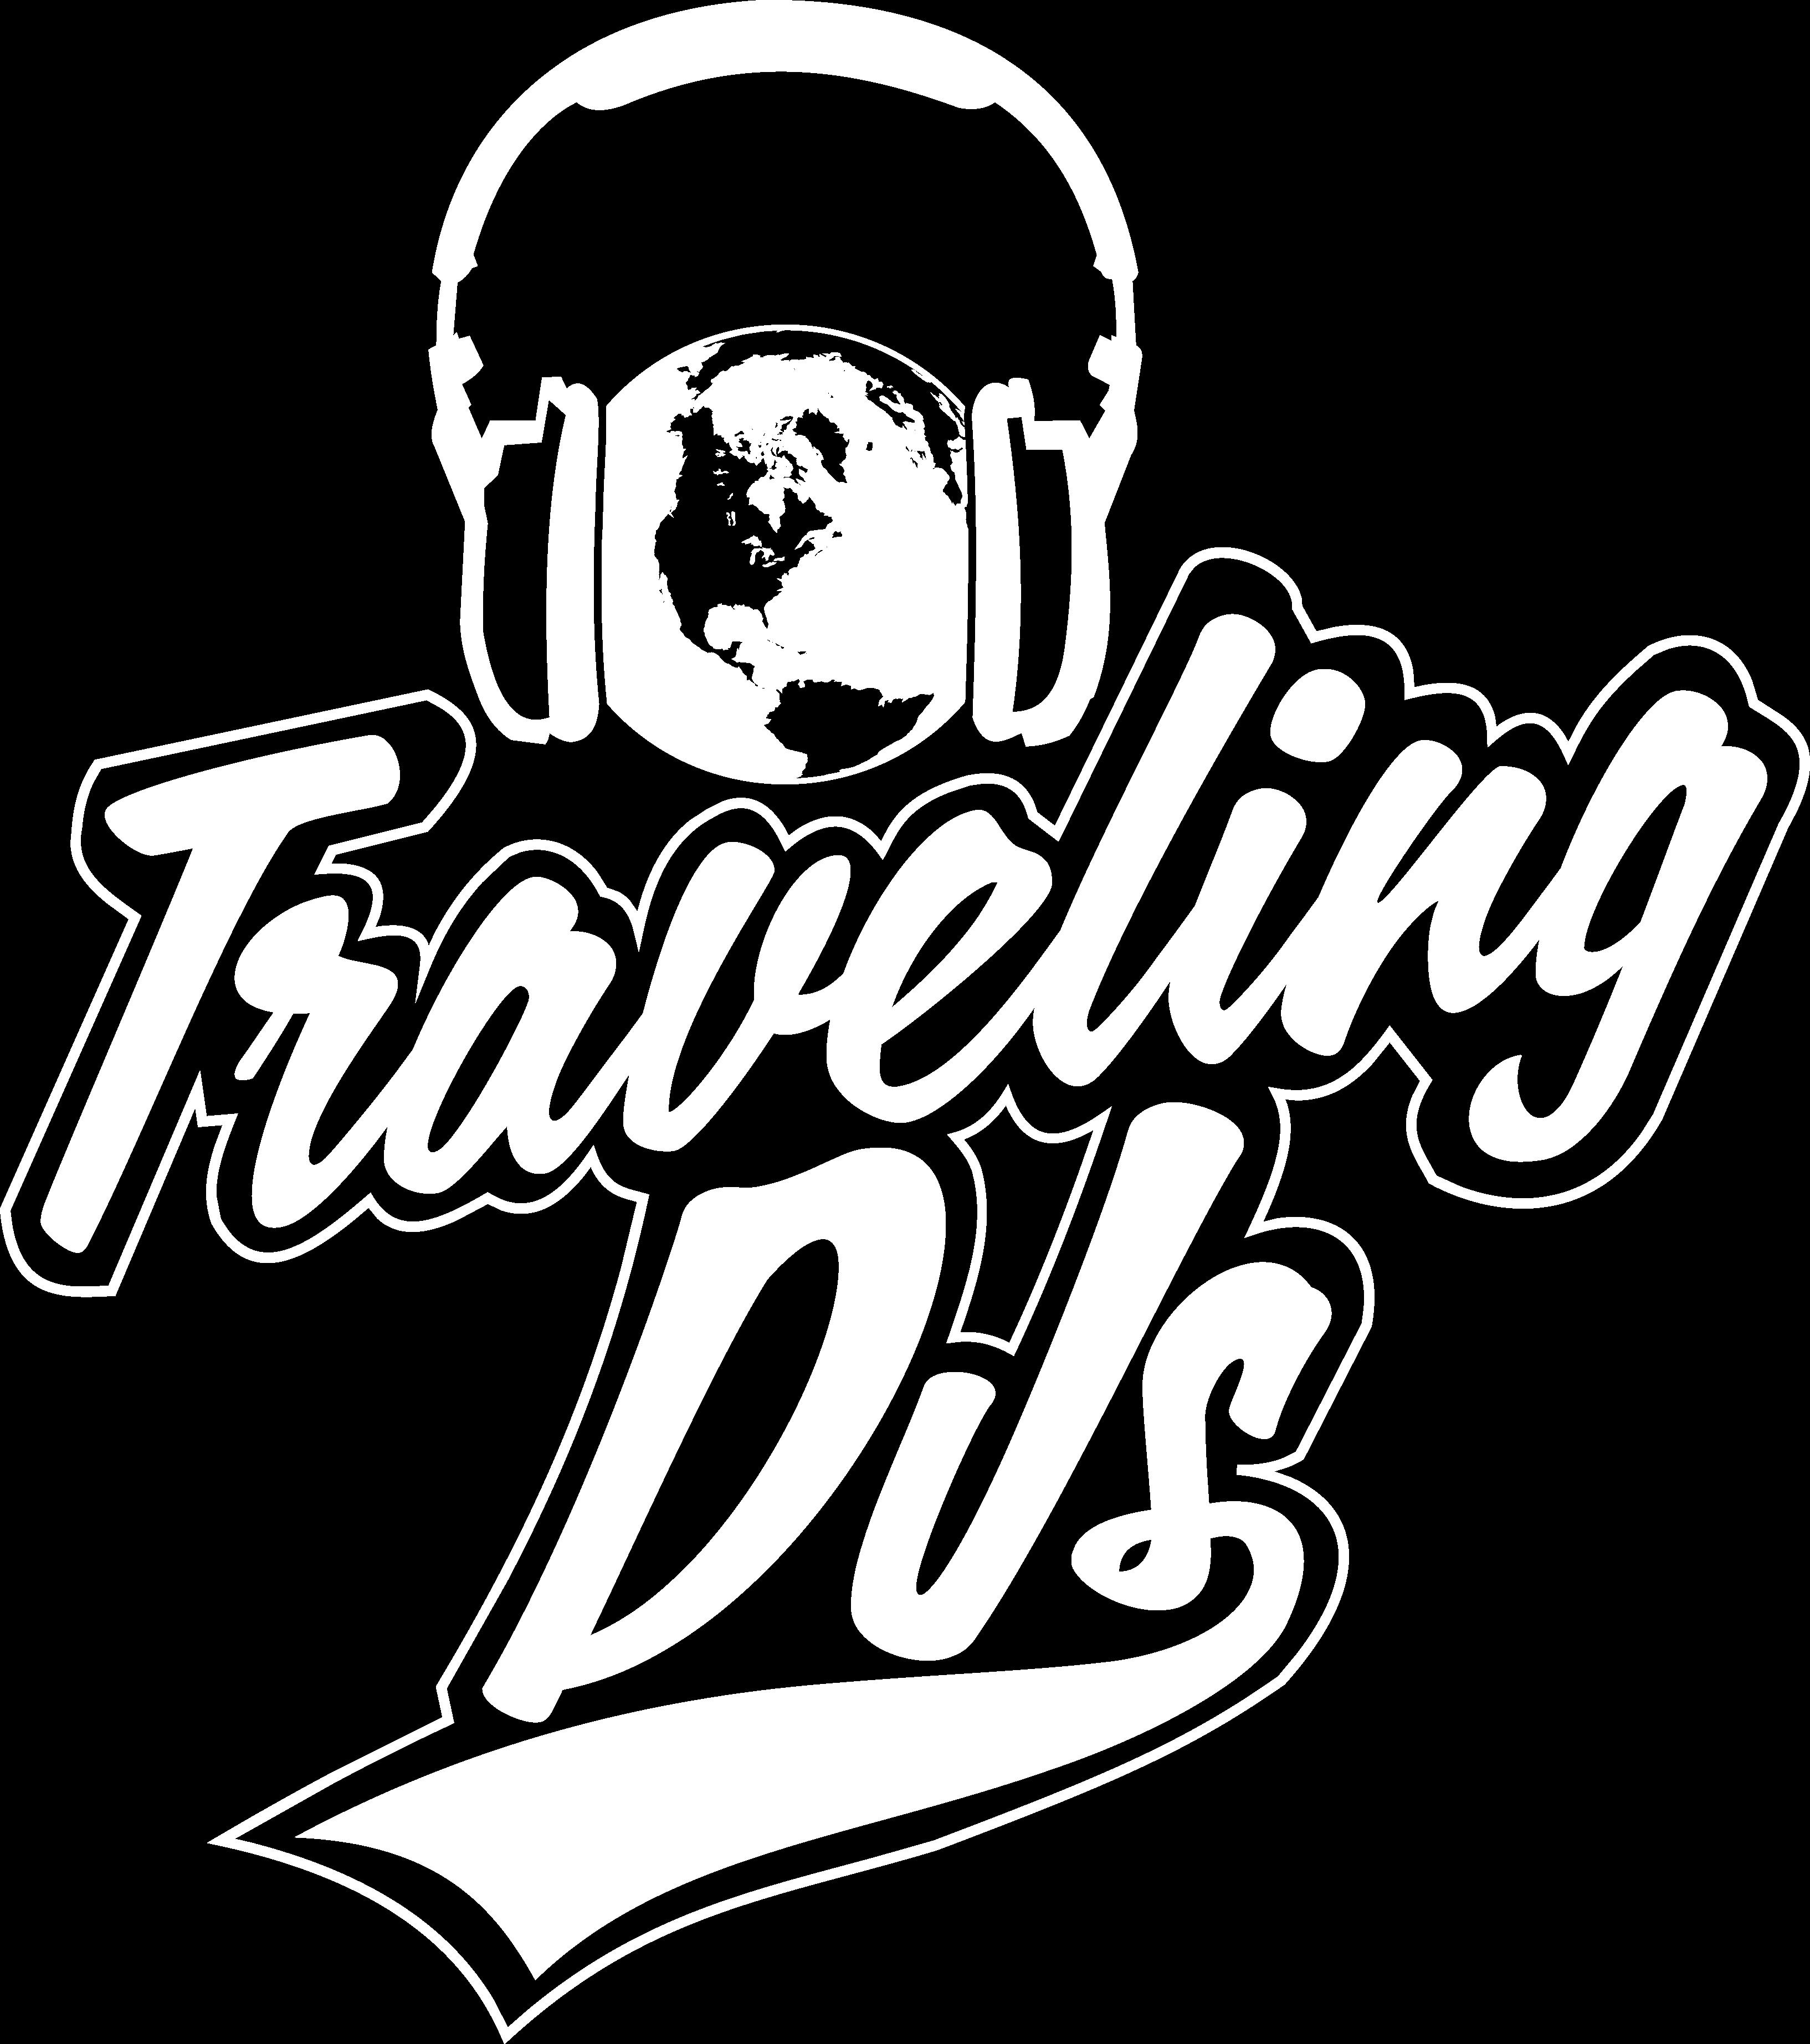 Traveling Djs